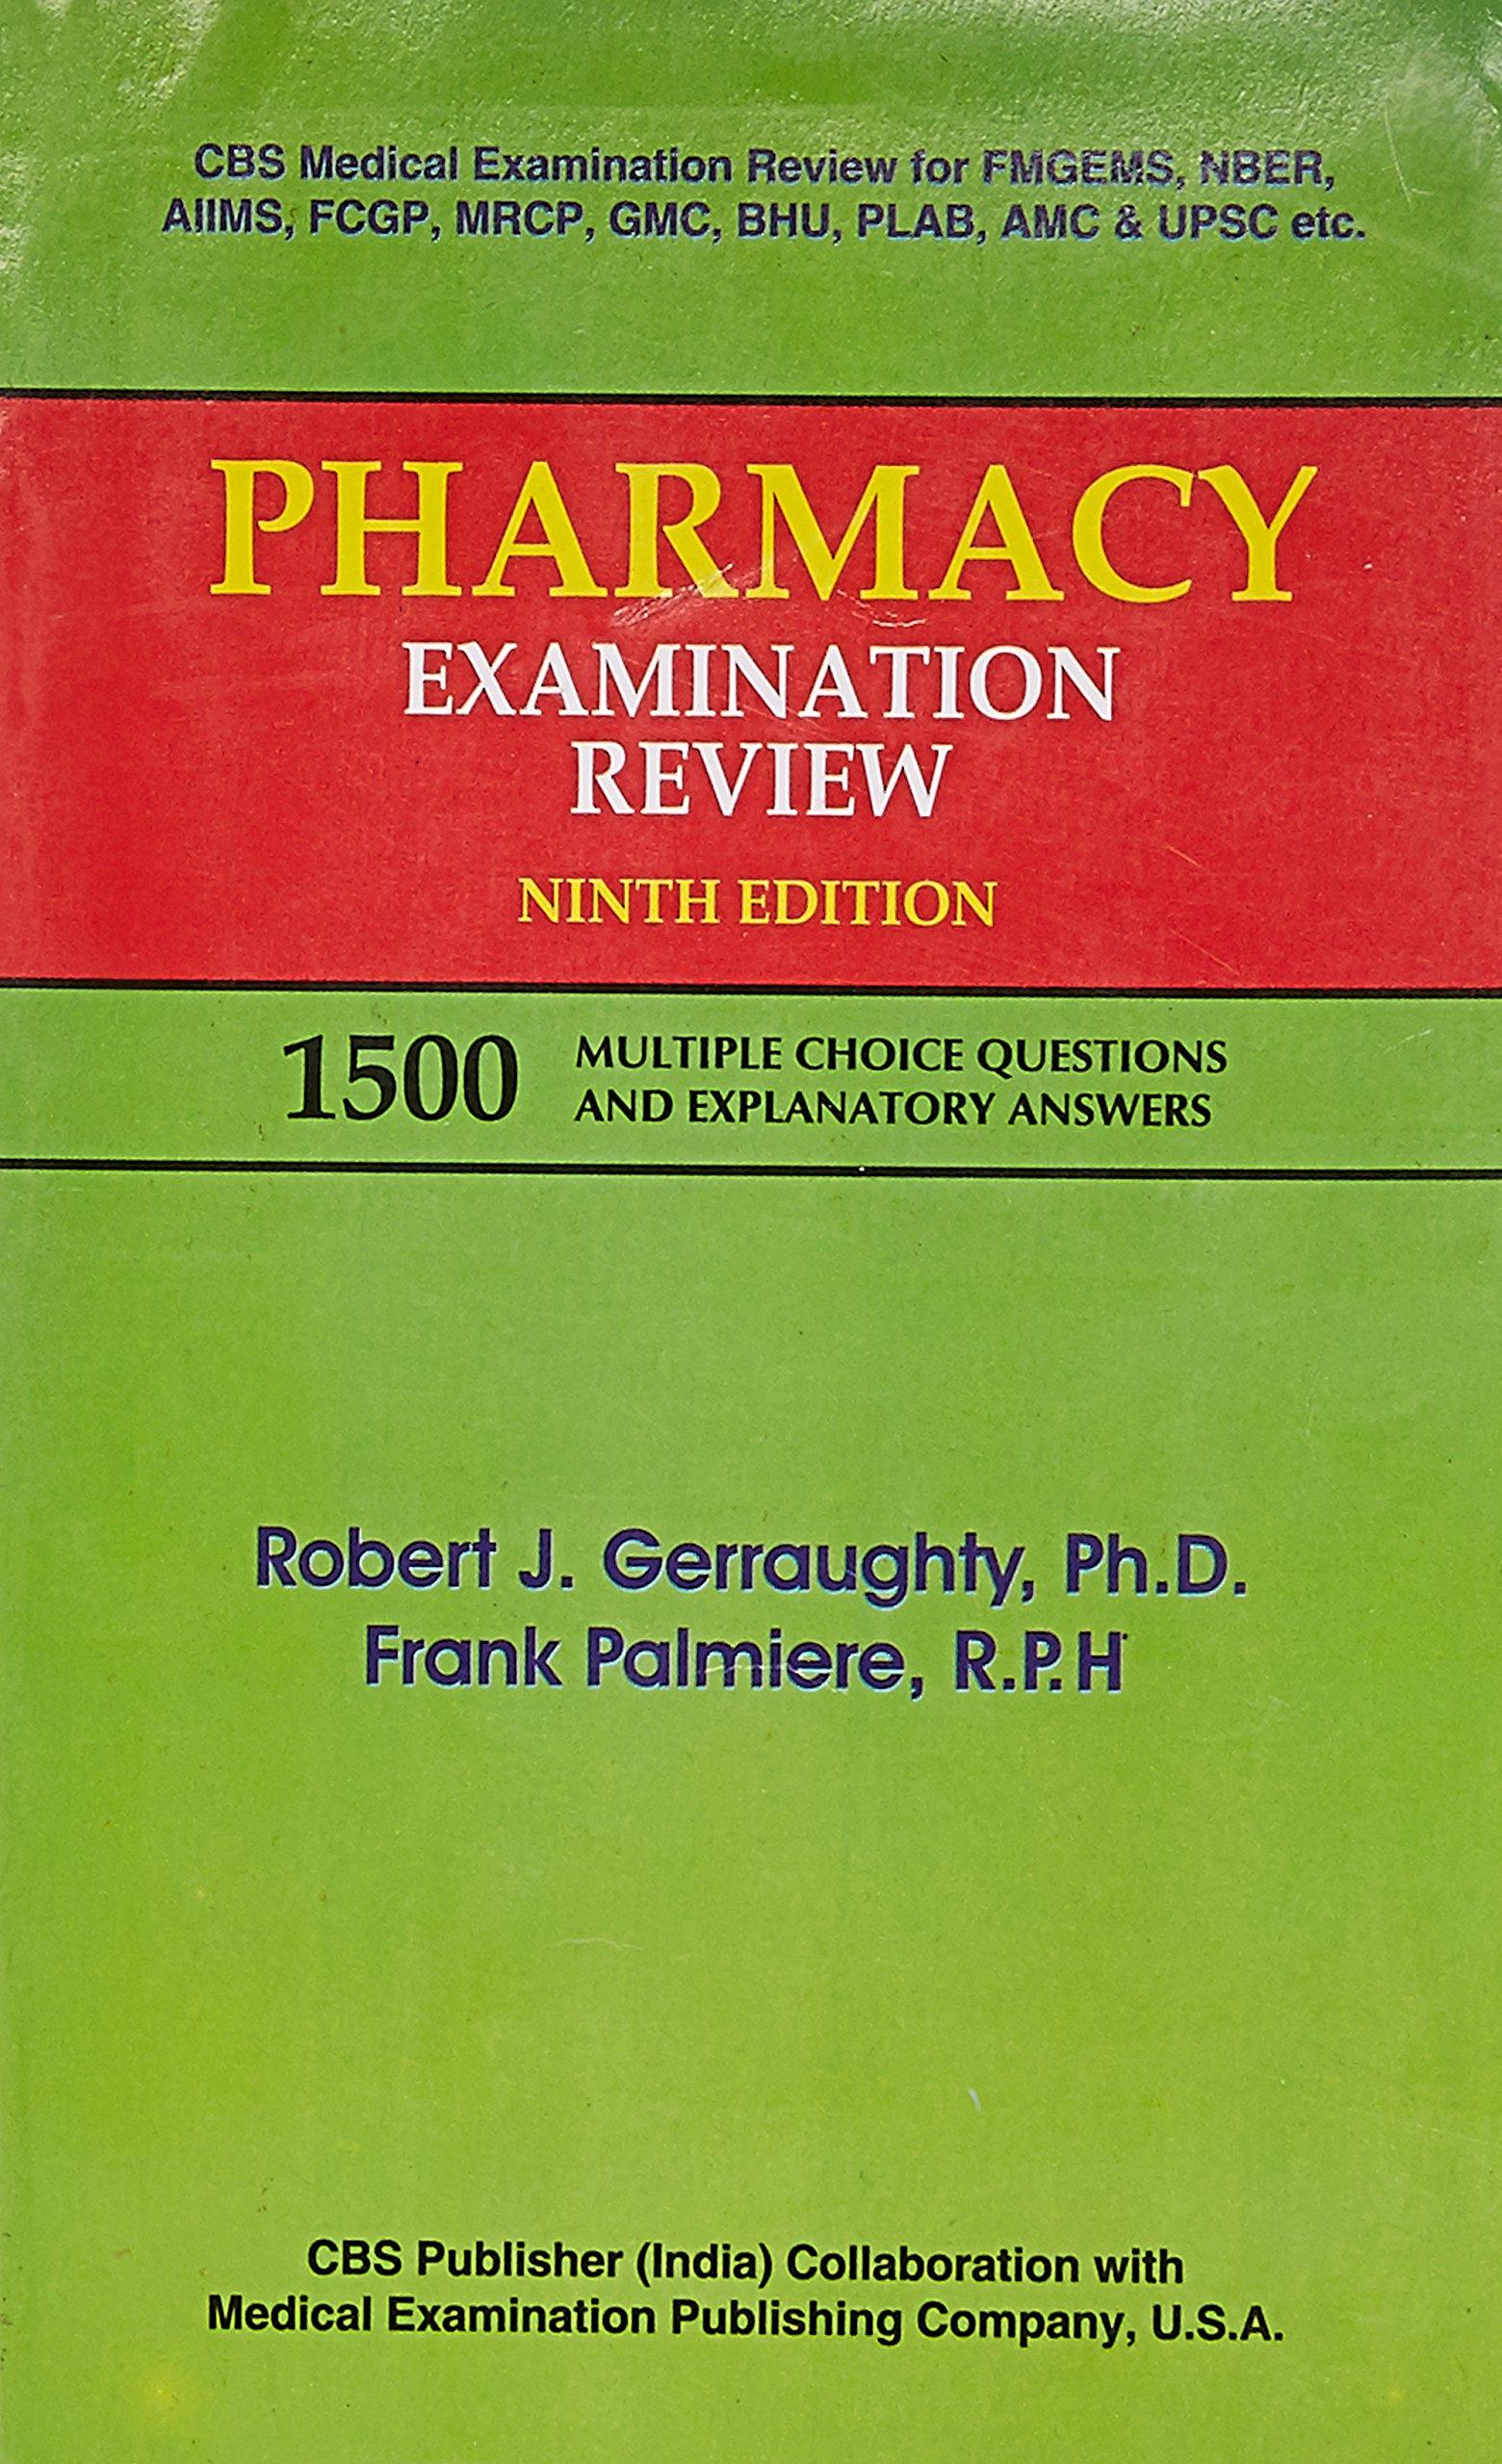 Buy Pharmacy Examination Review (1500 Multiple Choice